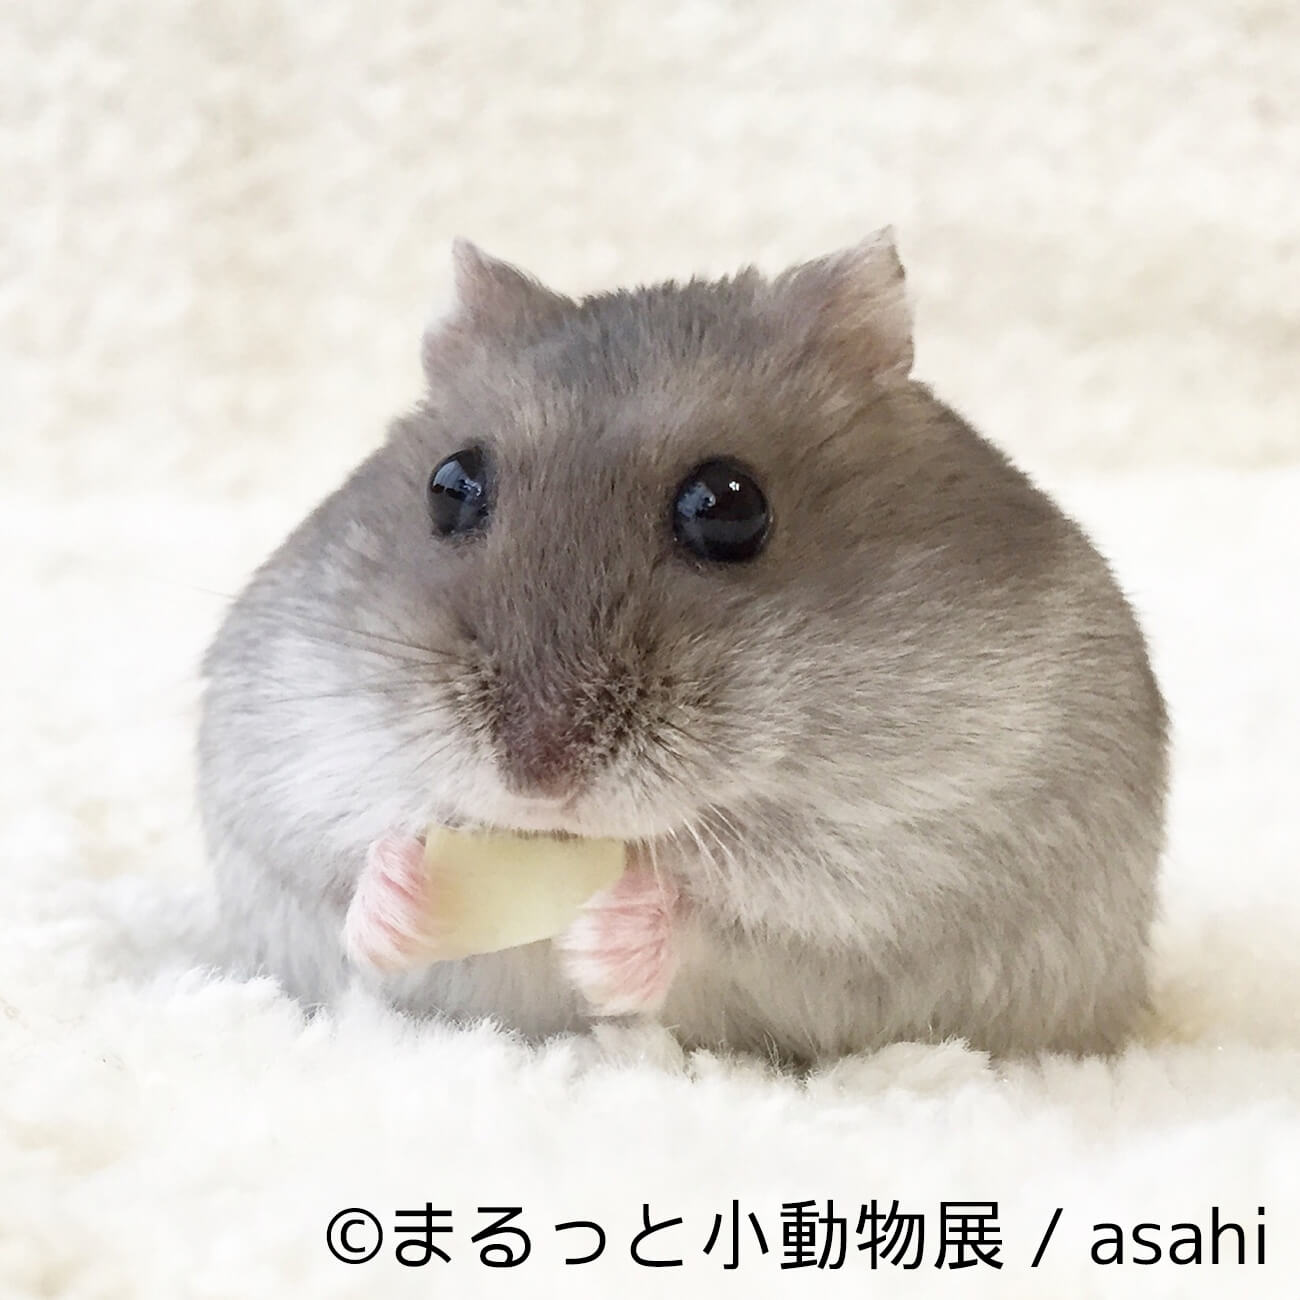 asahi | まるっと小動物展 | Fanimal(ファニマル)